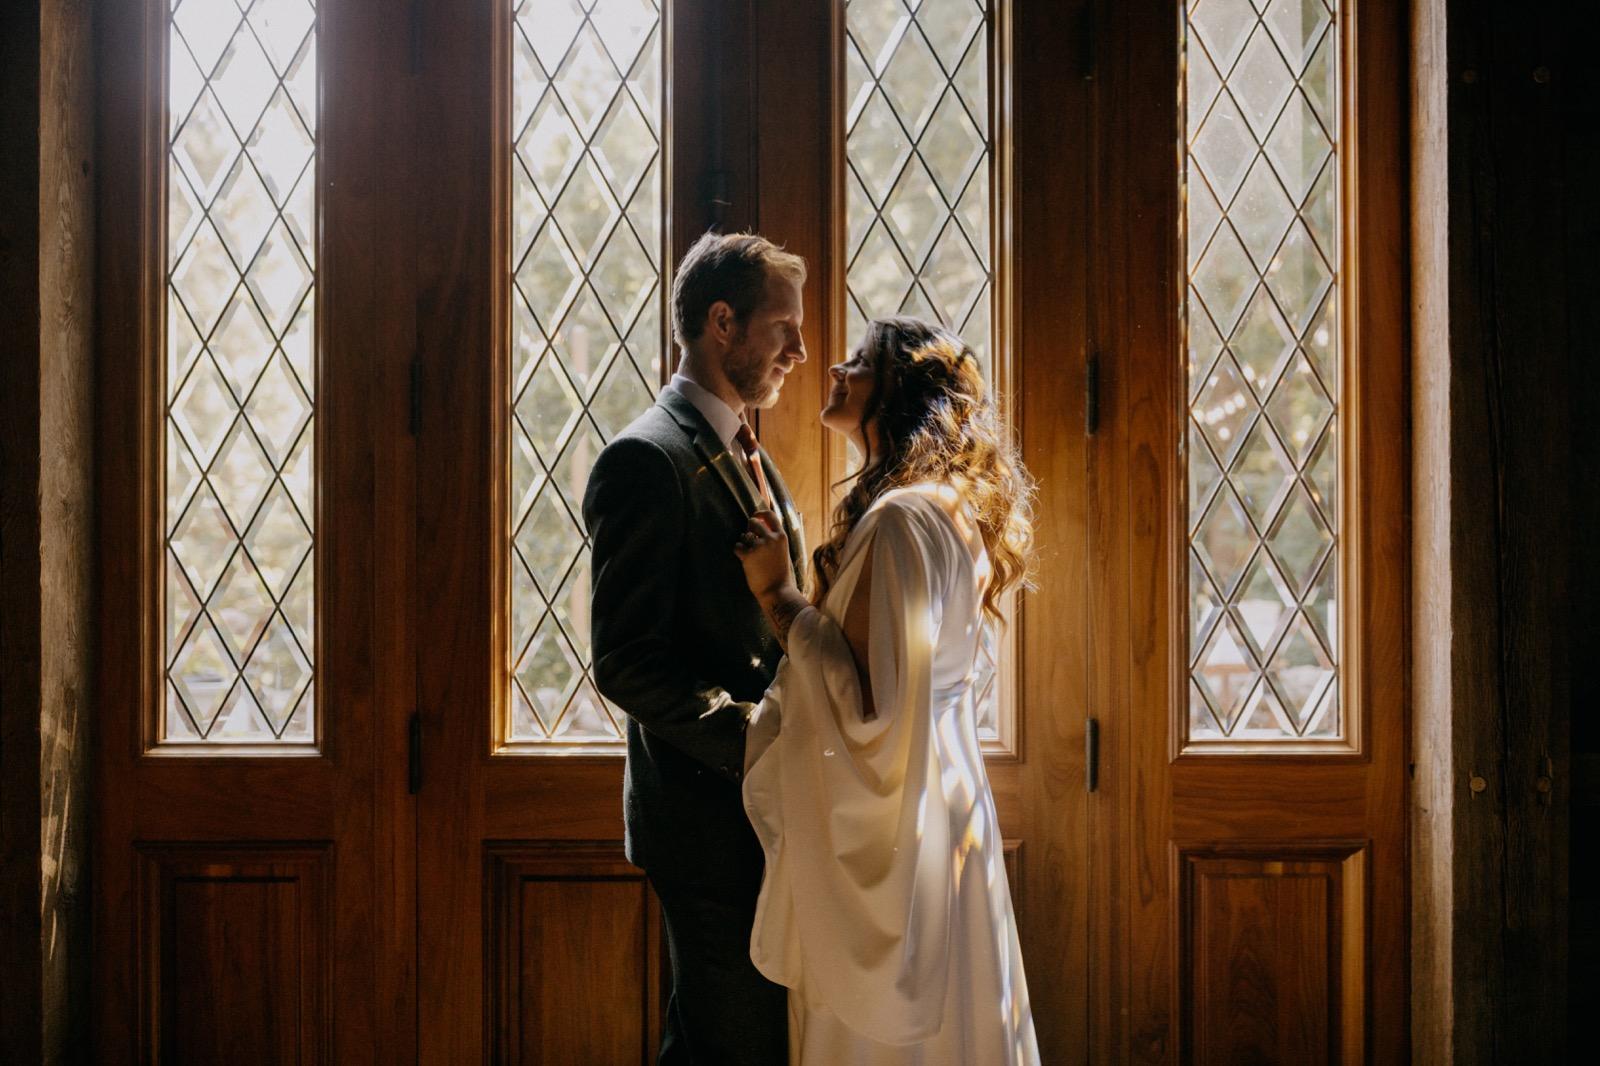 034_Emily & Jeff Wedding 0249_intimate_waterfall-lodge_forest_wedding_portrait_outdoor